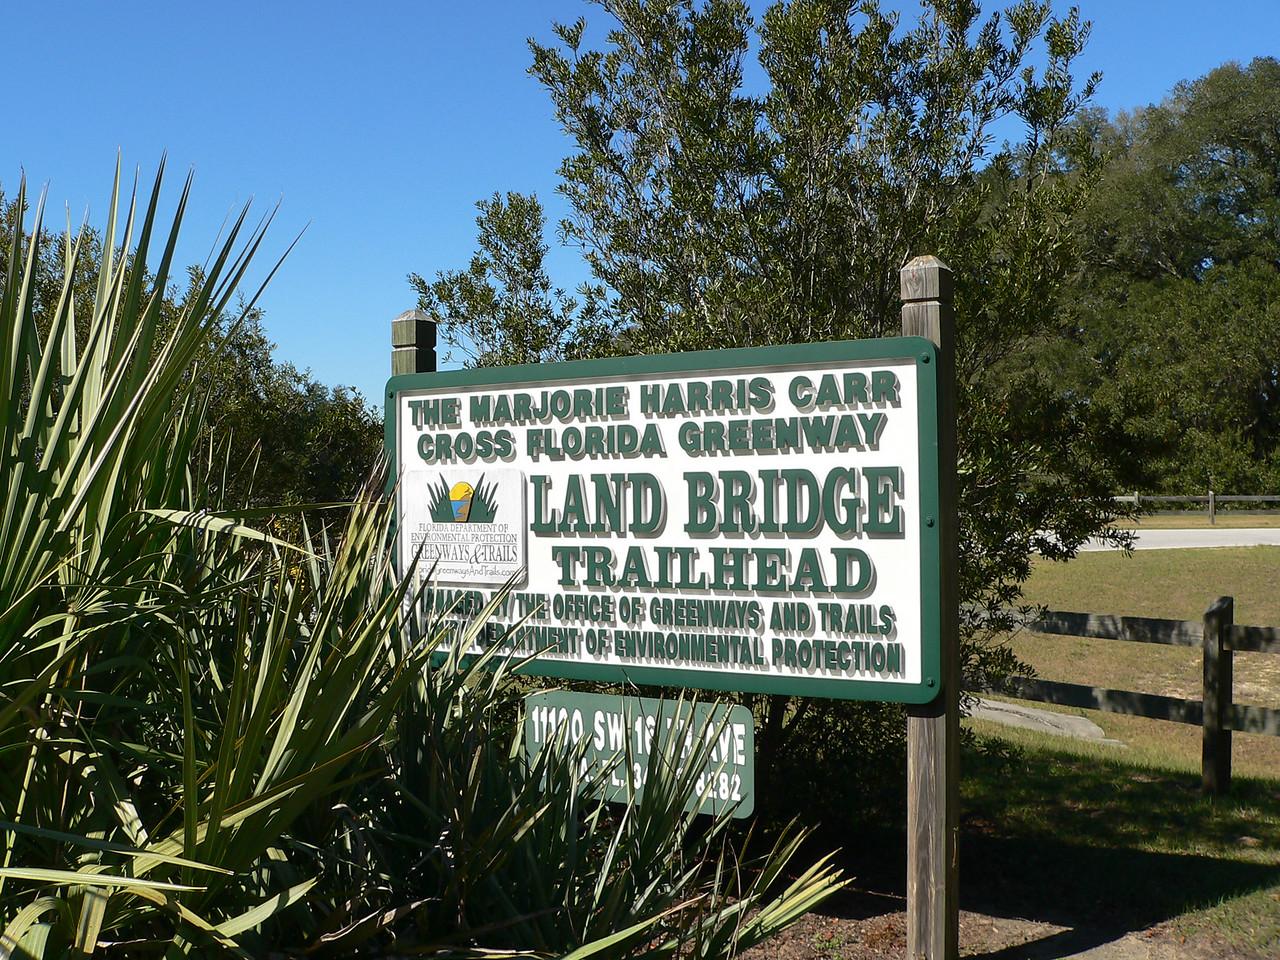 Land Bridge Trailhead<br /> PHOTO CREDIT: Florida Trail Association / Diane Dammiller